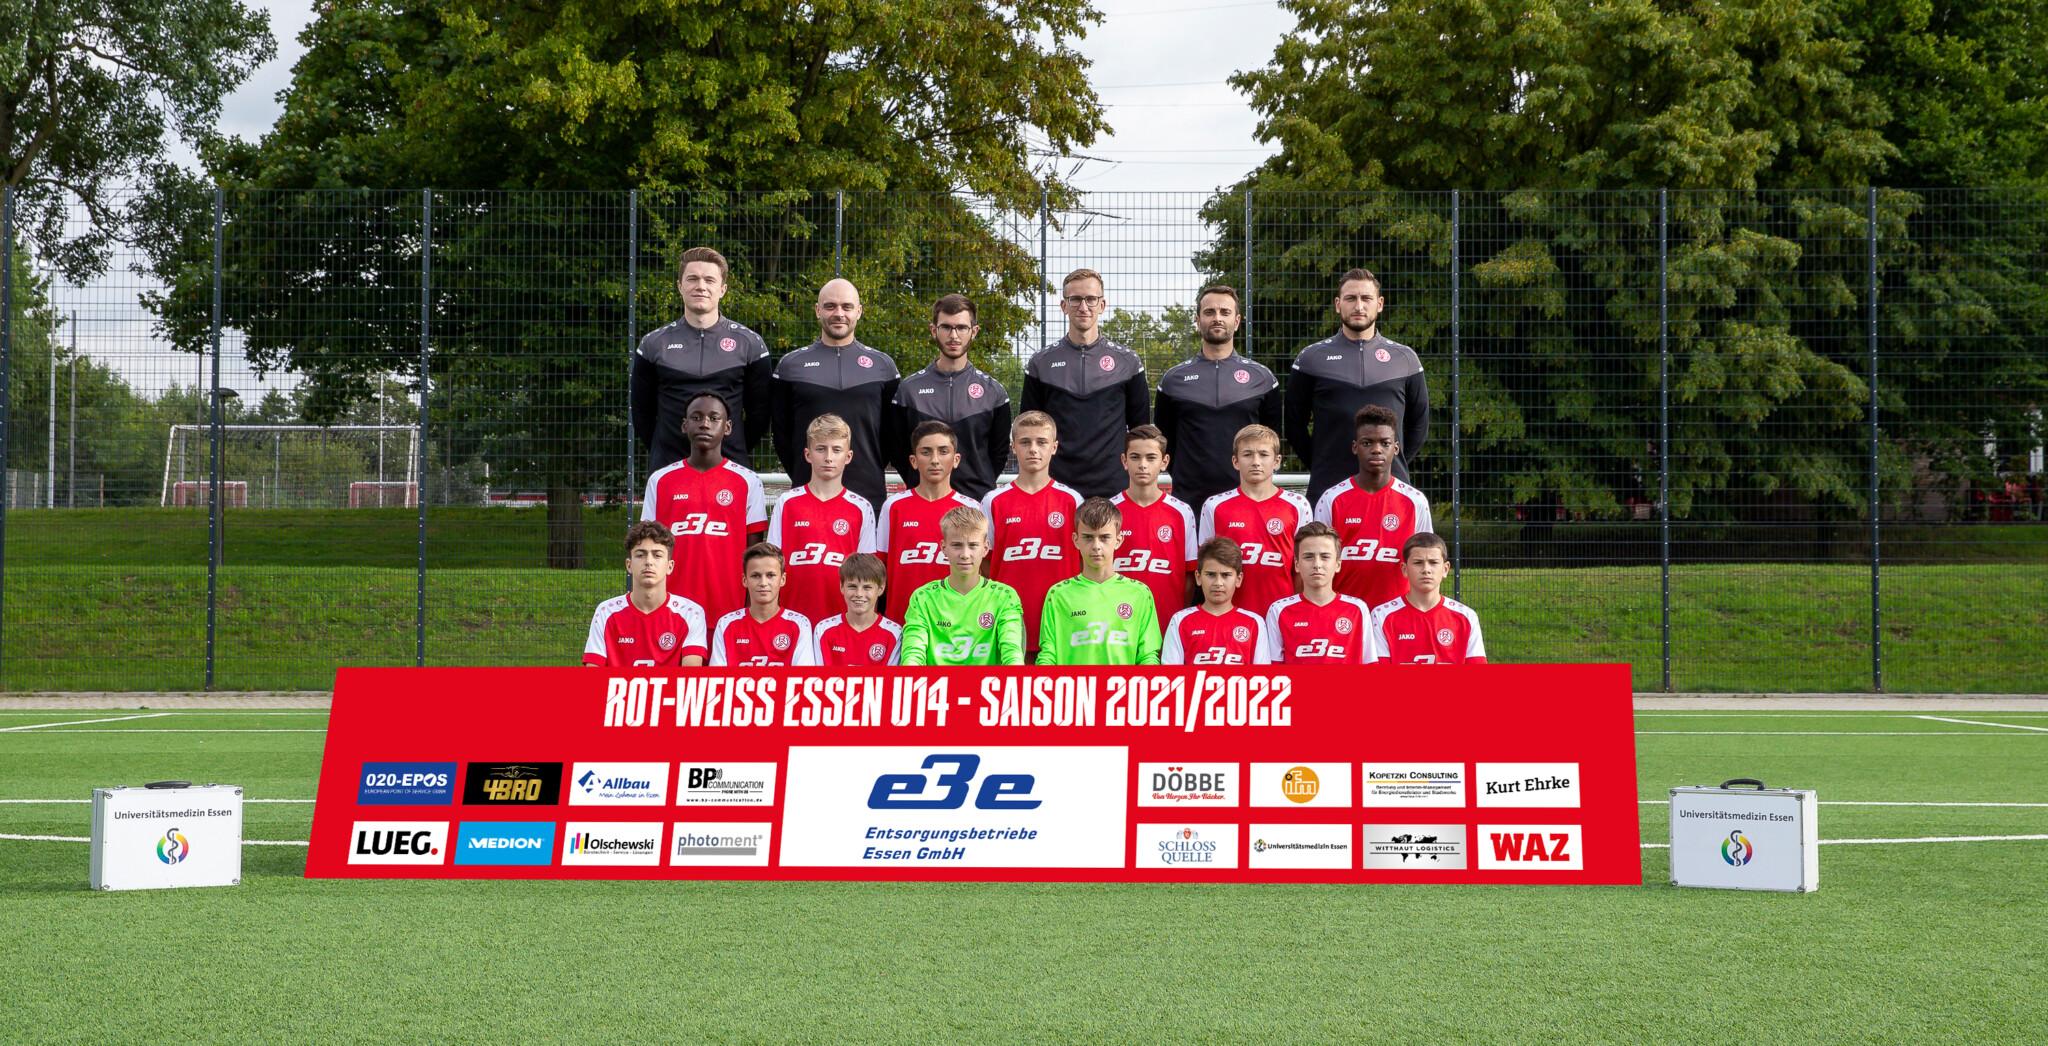 U14 – Rot-Weiss Essen